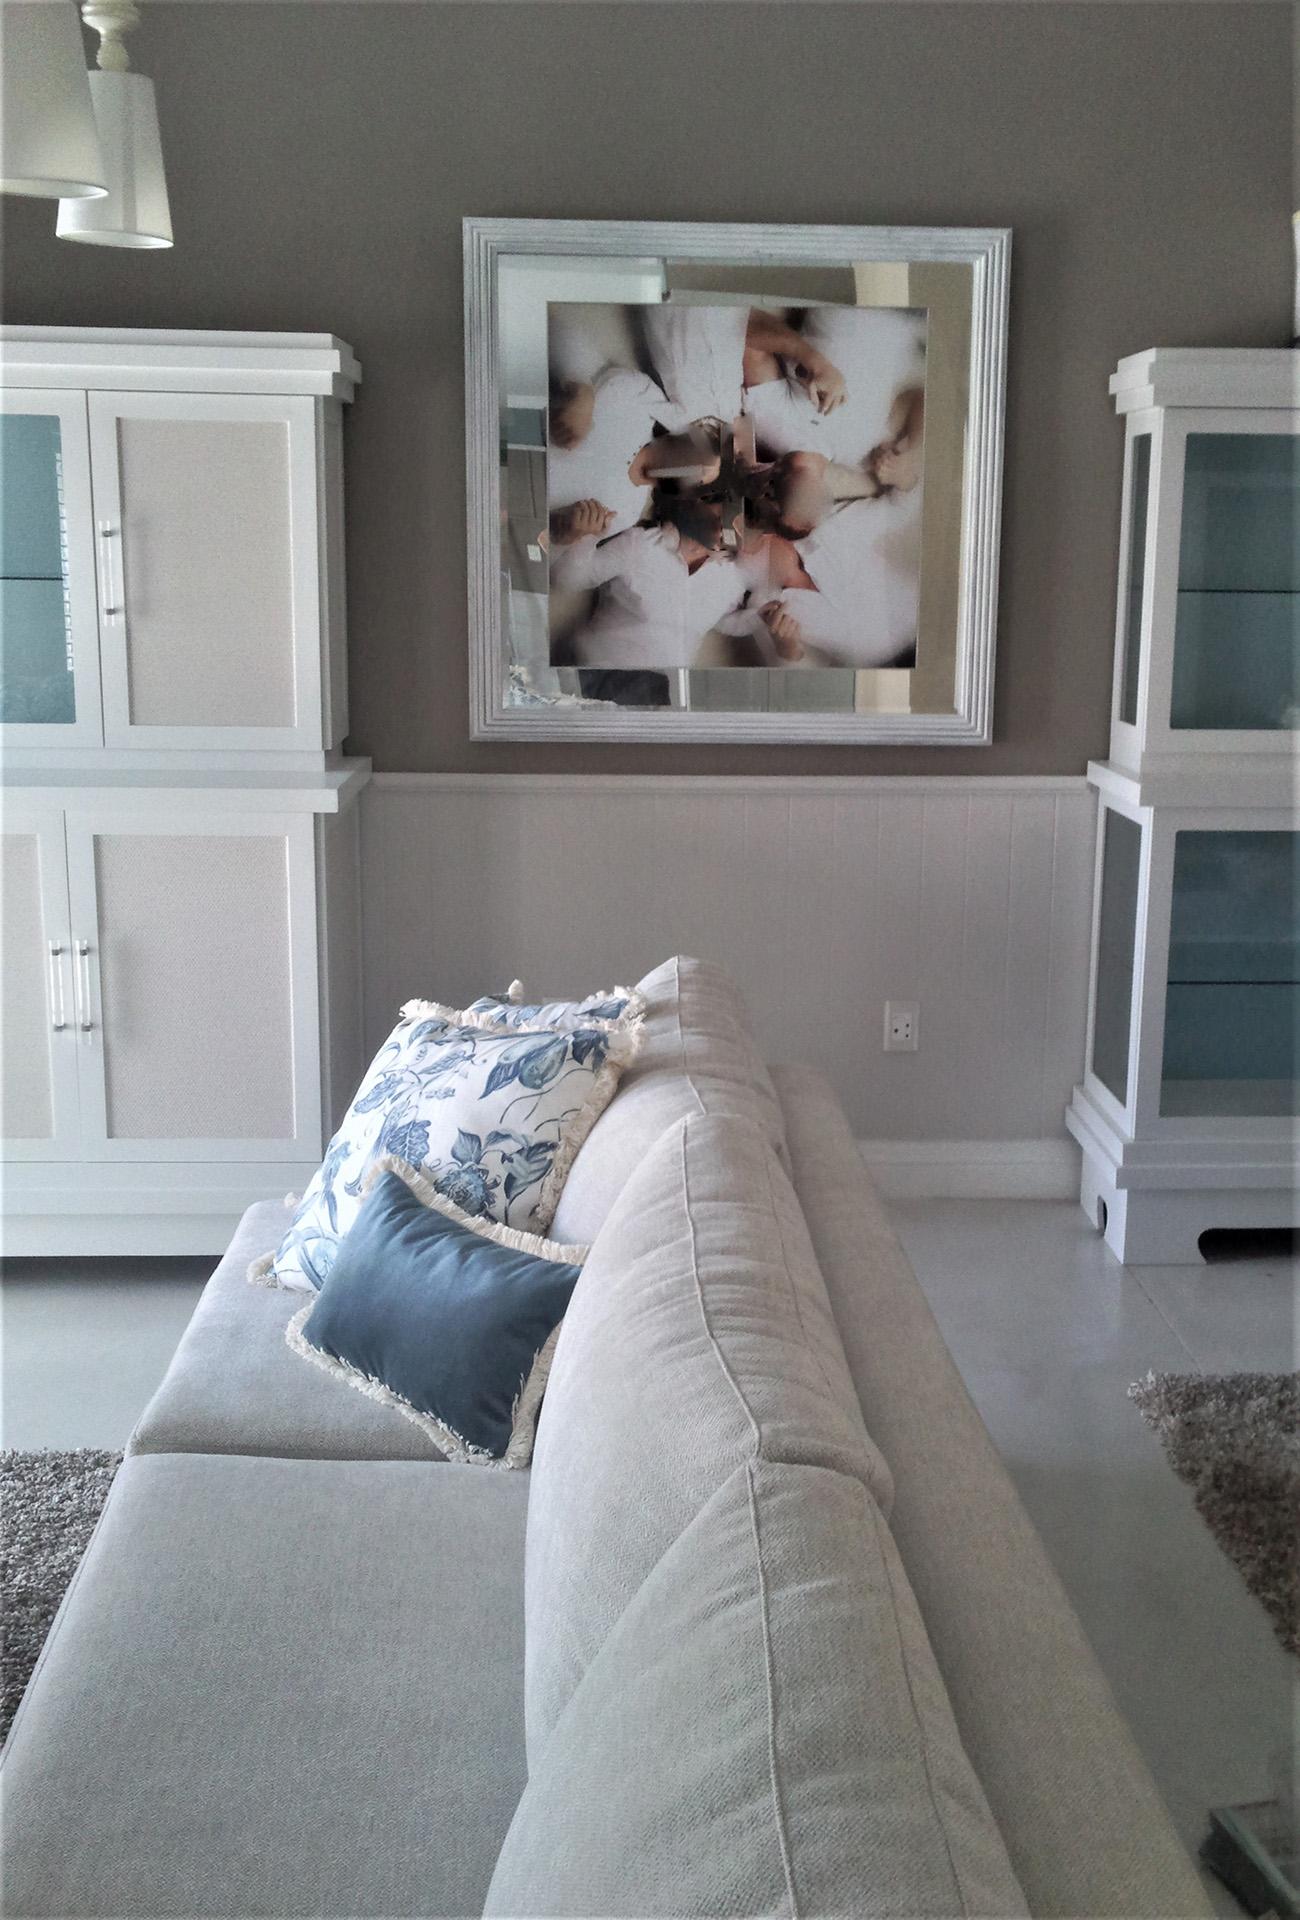 TV room sofa